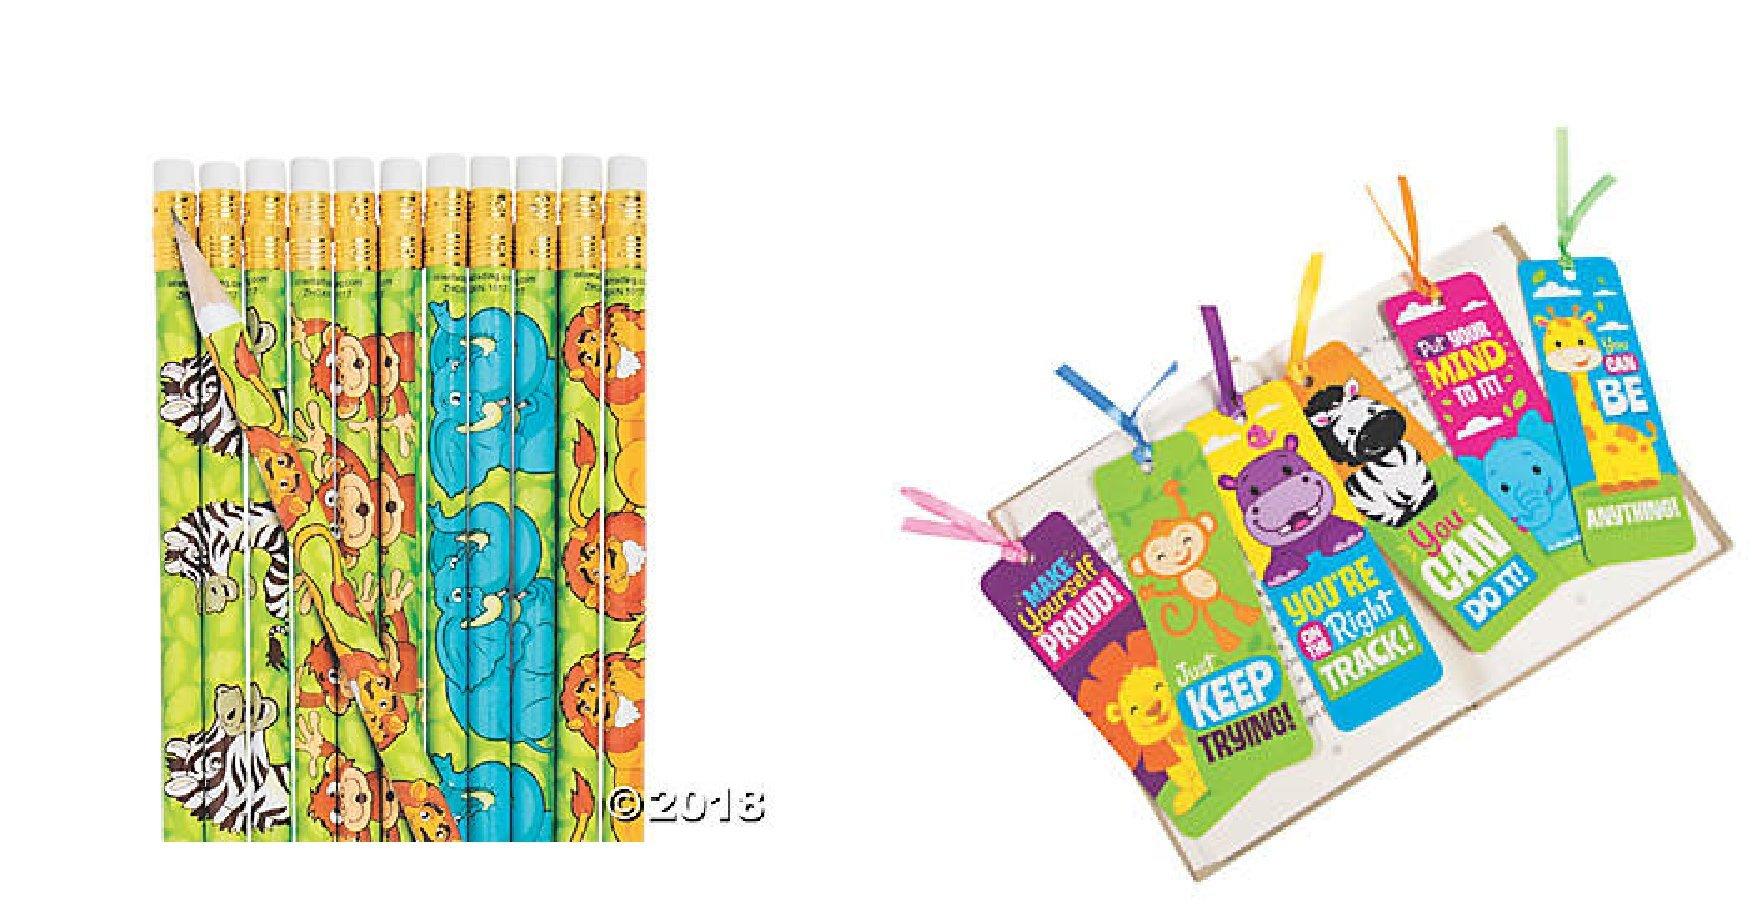 CVN Adorable 72 pce. Jungle / Safari / Zoo Animal Party Favors / Student-Classroom Prizes / 24 Zoo Animal Pencils & 48 Laminated Jungle Bookmarks